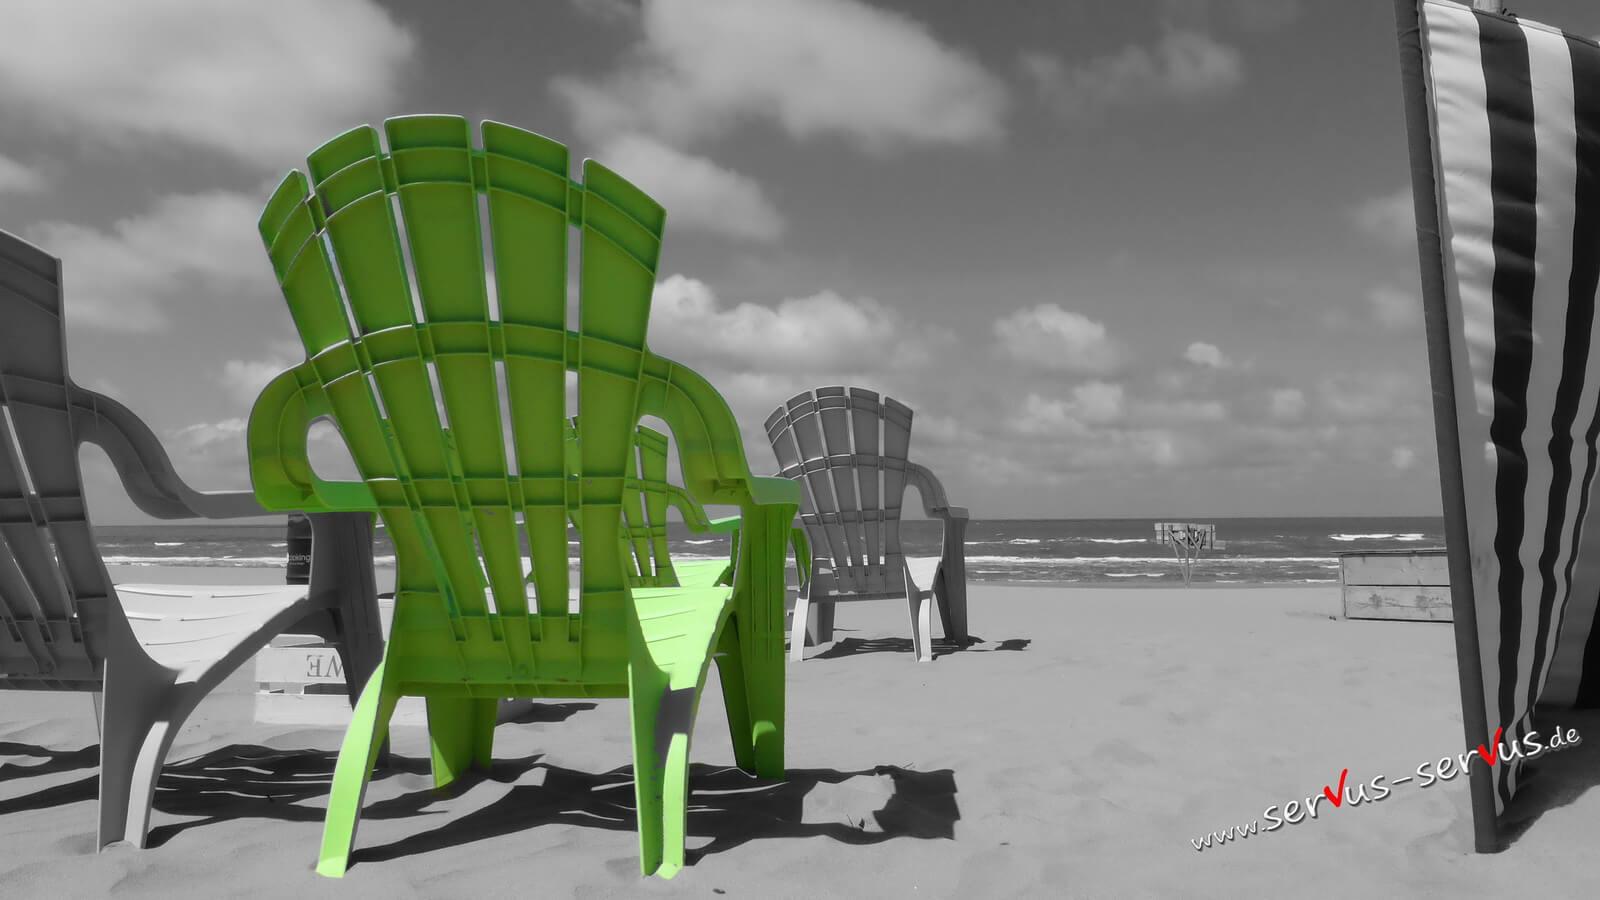 Grüner Stuhl am Strand, colorkey